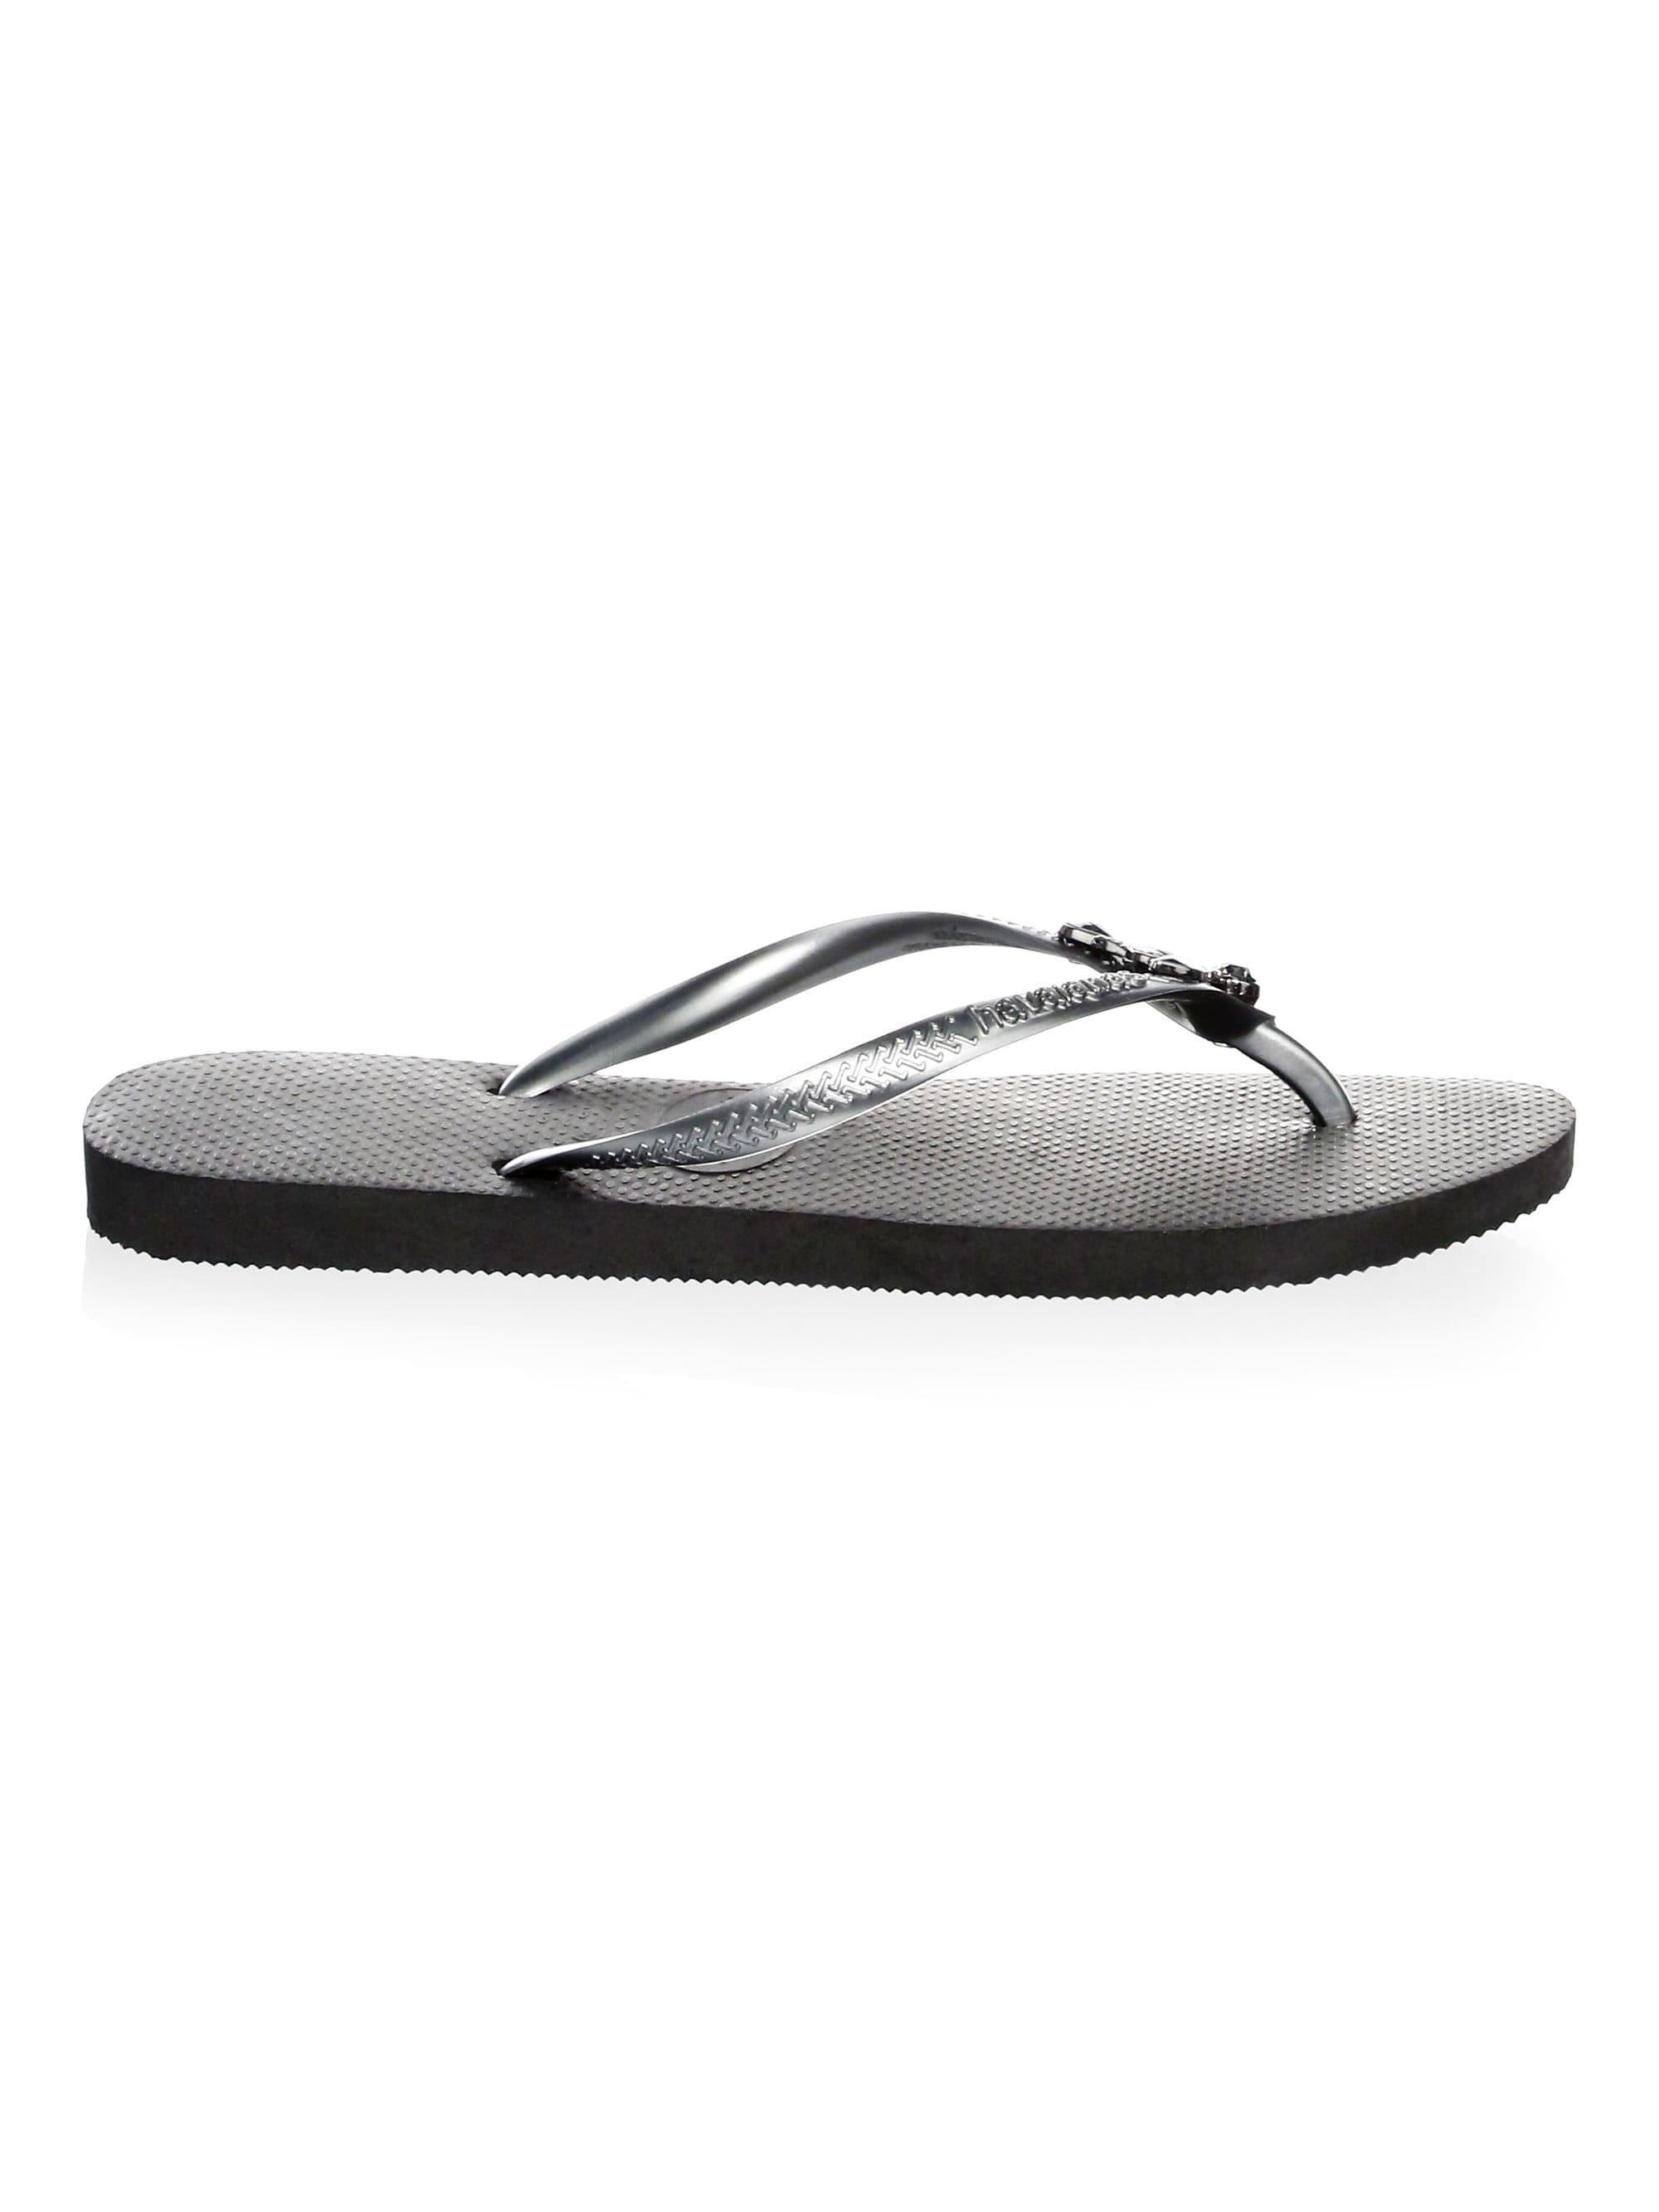 37379db399ee6 Havaianas - Black Women s Slim Lux Swarovski Crystal Flip Flops - Sand -  Size 39-